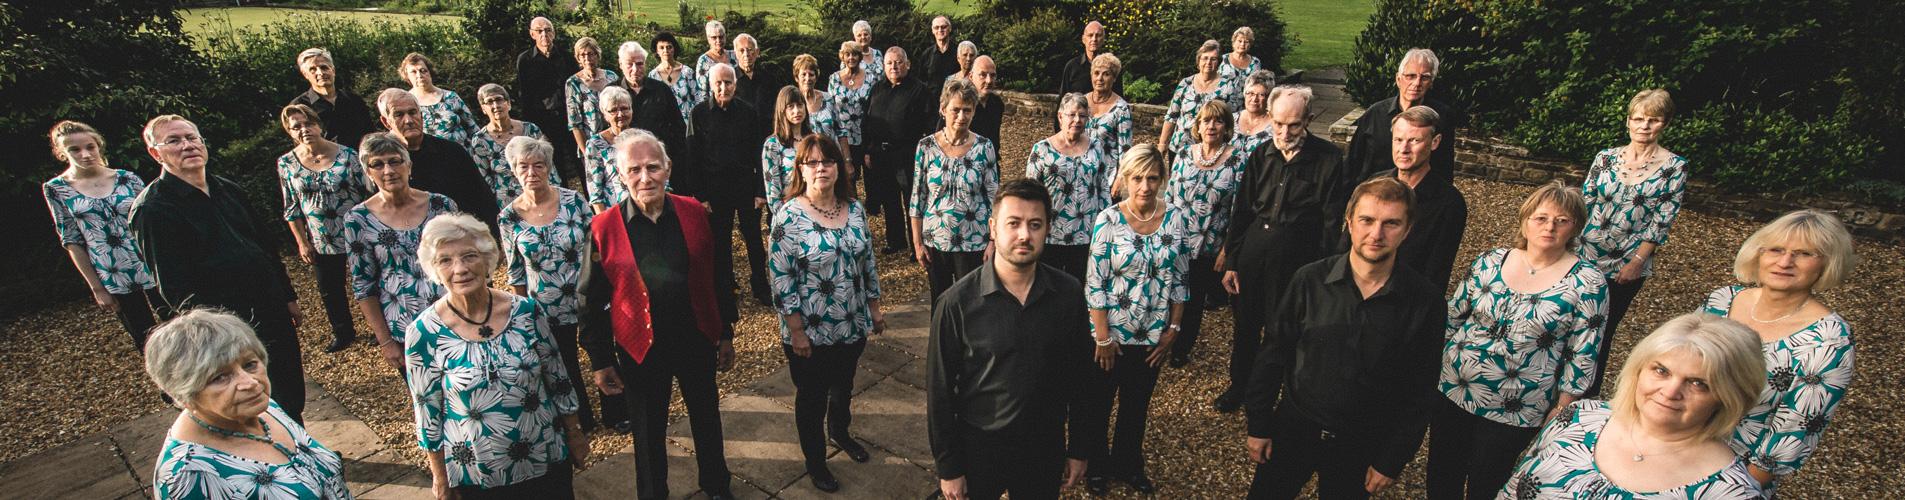 KVU Singers Group